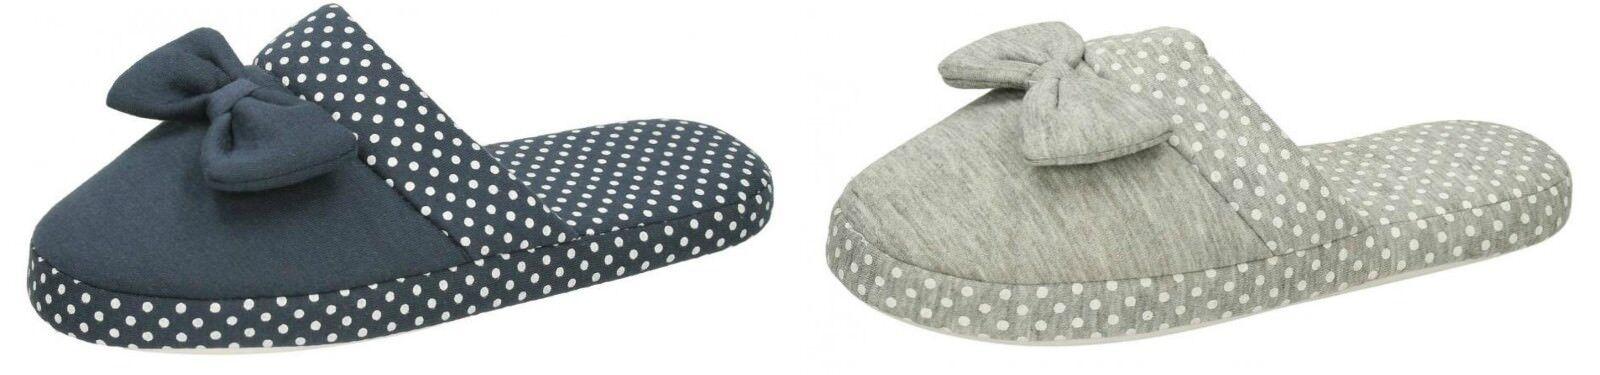 x2R099- Ladies Detail- Flat Mule Slippers- Bow/Spotted Detail- Ladies Grey & Navy- Great Price 61590c